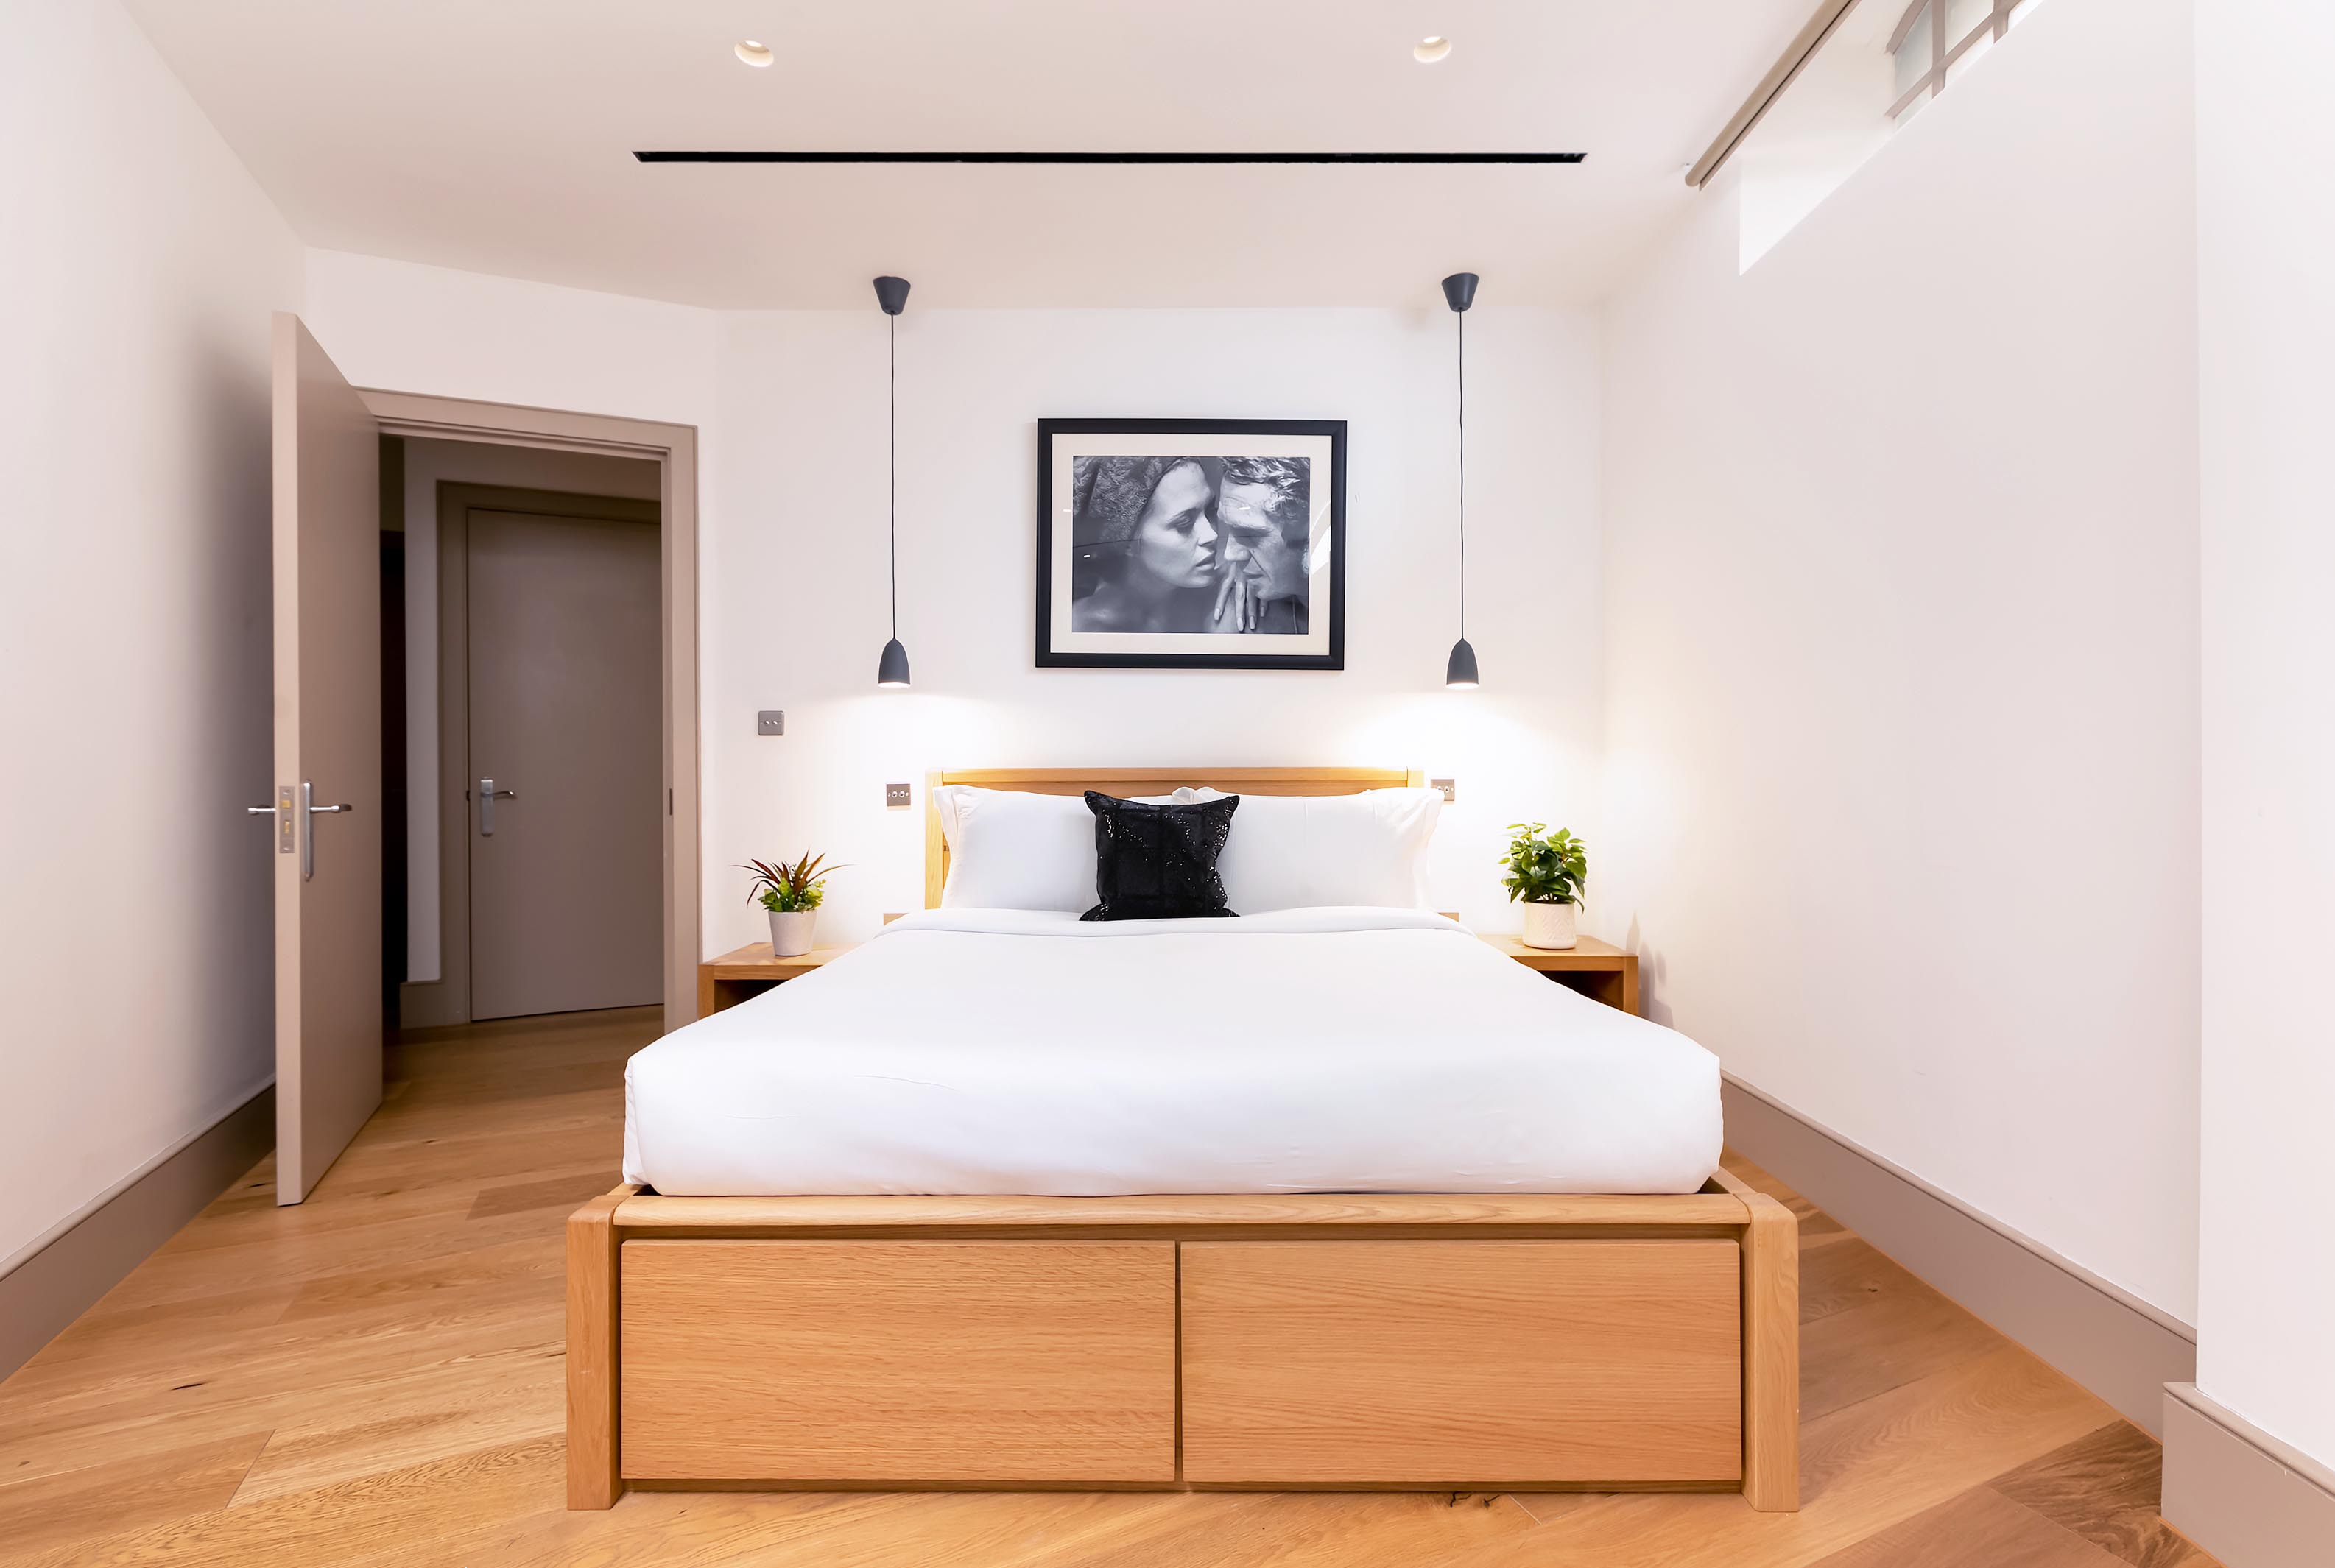 Lovelydays luxury service apartment rental - London - Fitzrovia - Wells Mews B - Lovelysuite - 2 bedrooms - 2 bathrooms - Double bed - 291151792e80 - Lovelydays